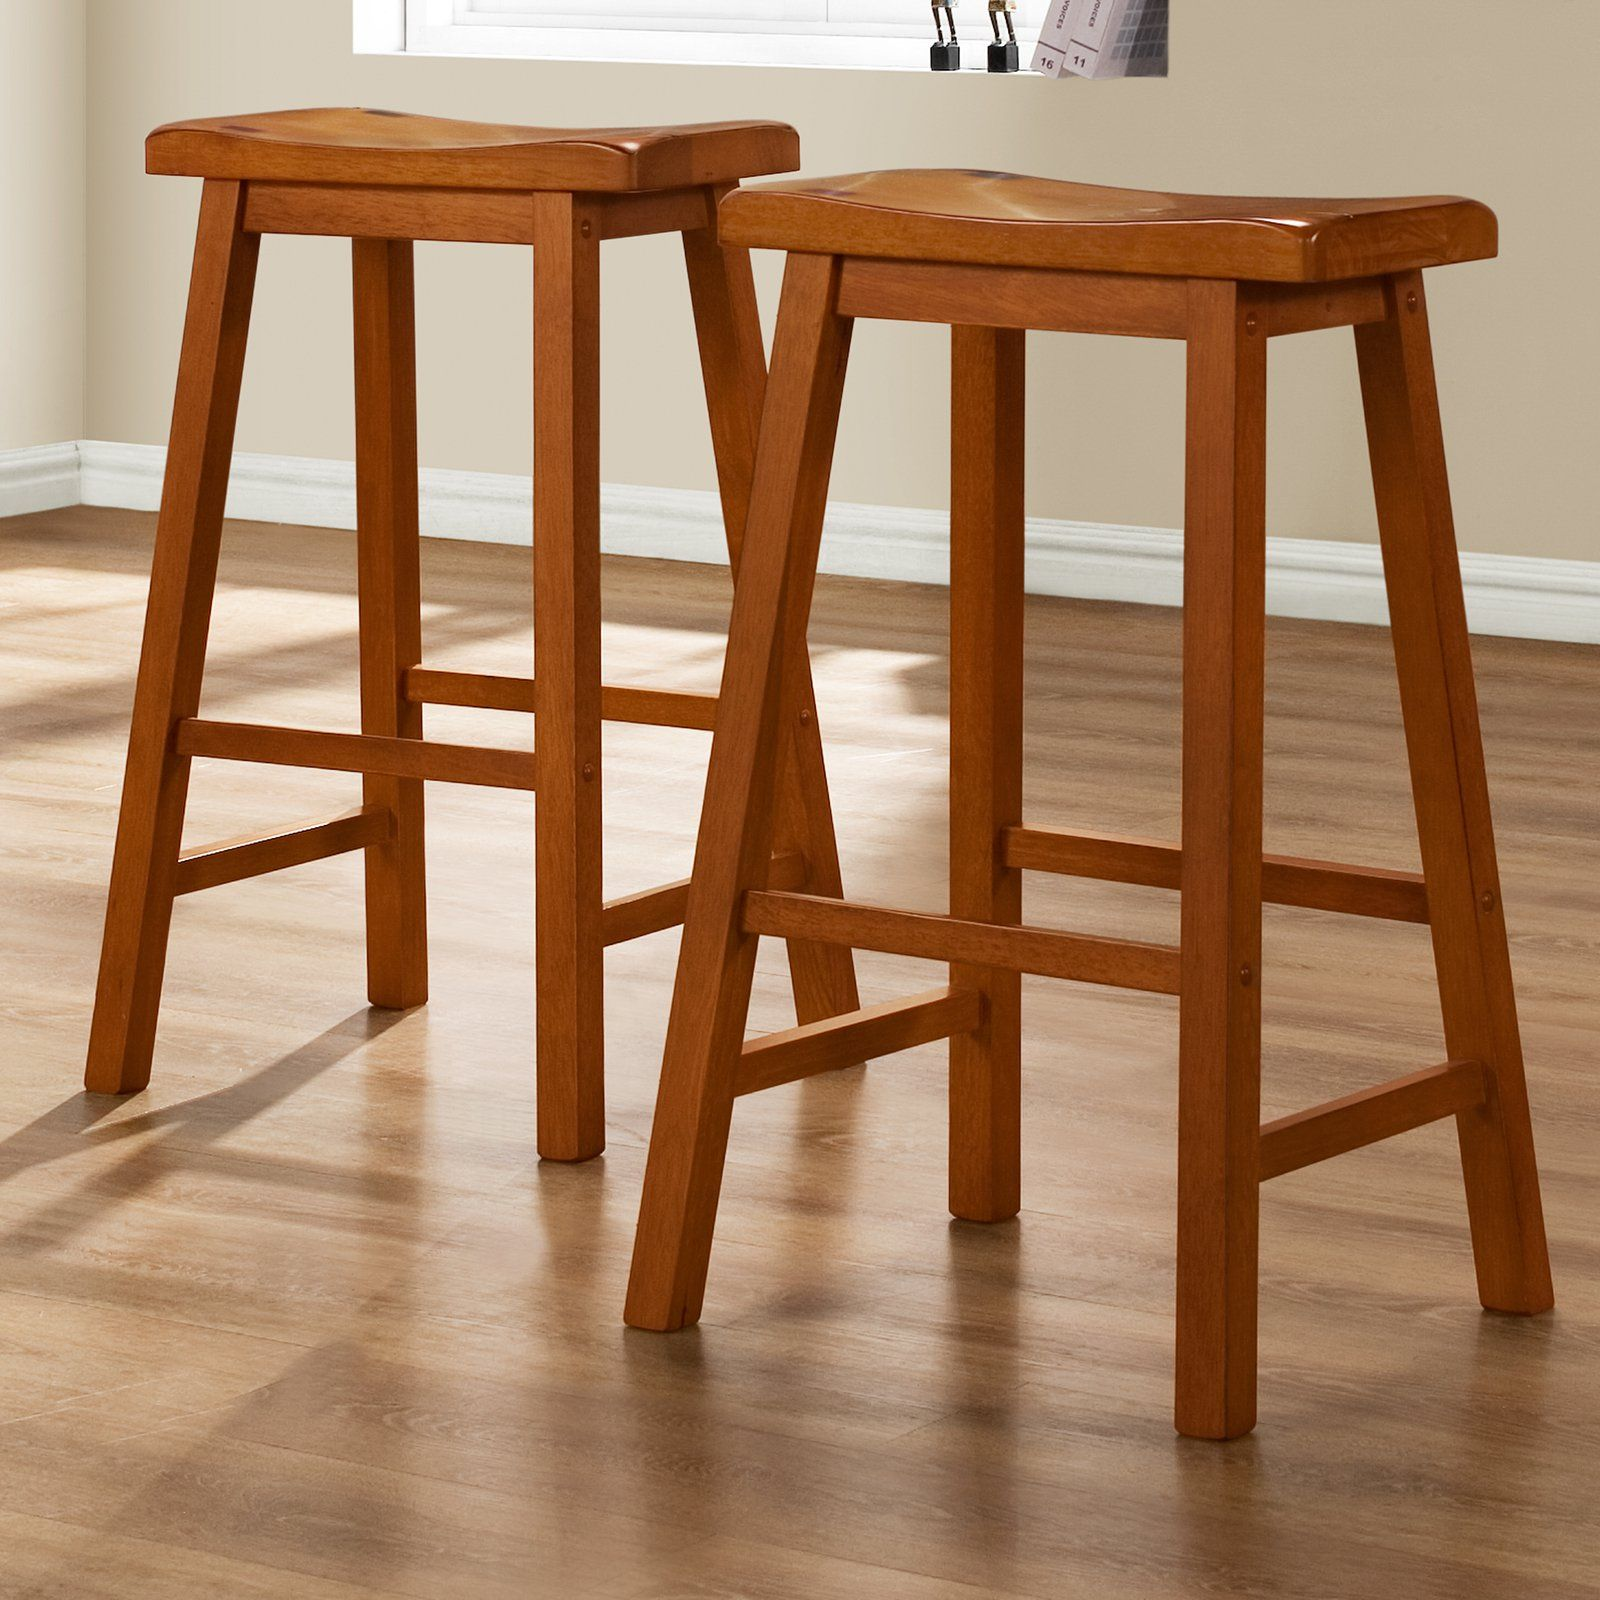 Weston Home 29 In Saddle Back Stool Oak 5302a 29 3a 2pc Oak Stool Oak Bar Stools Furniture Design Modern